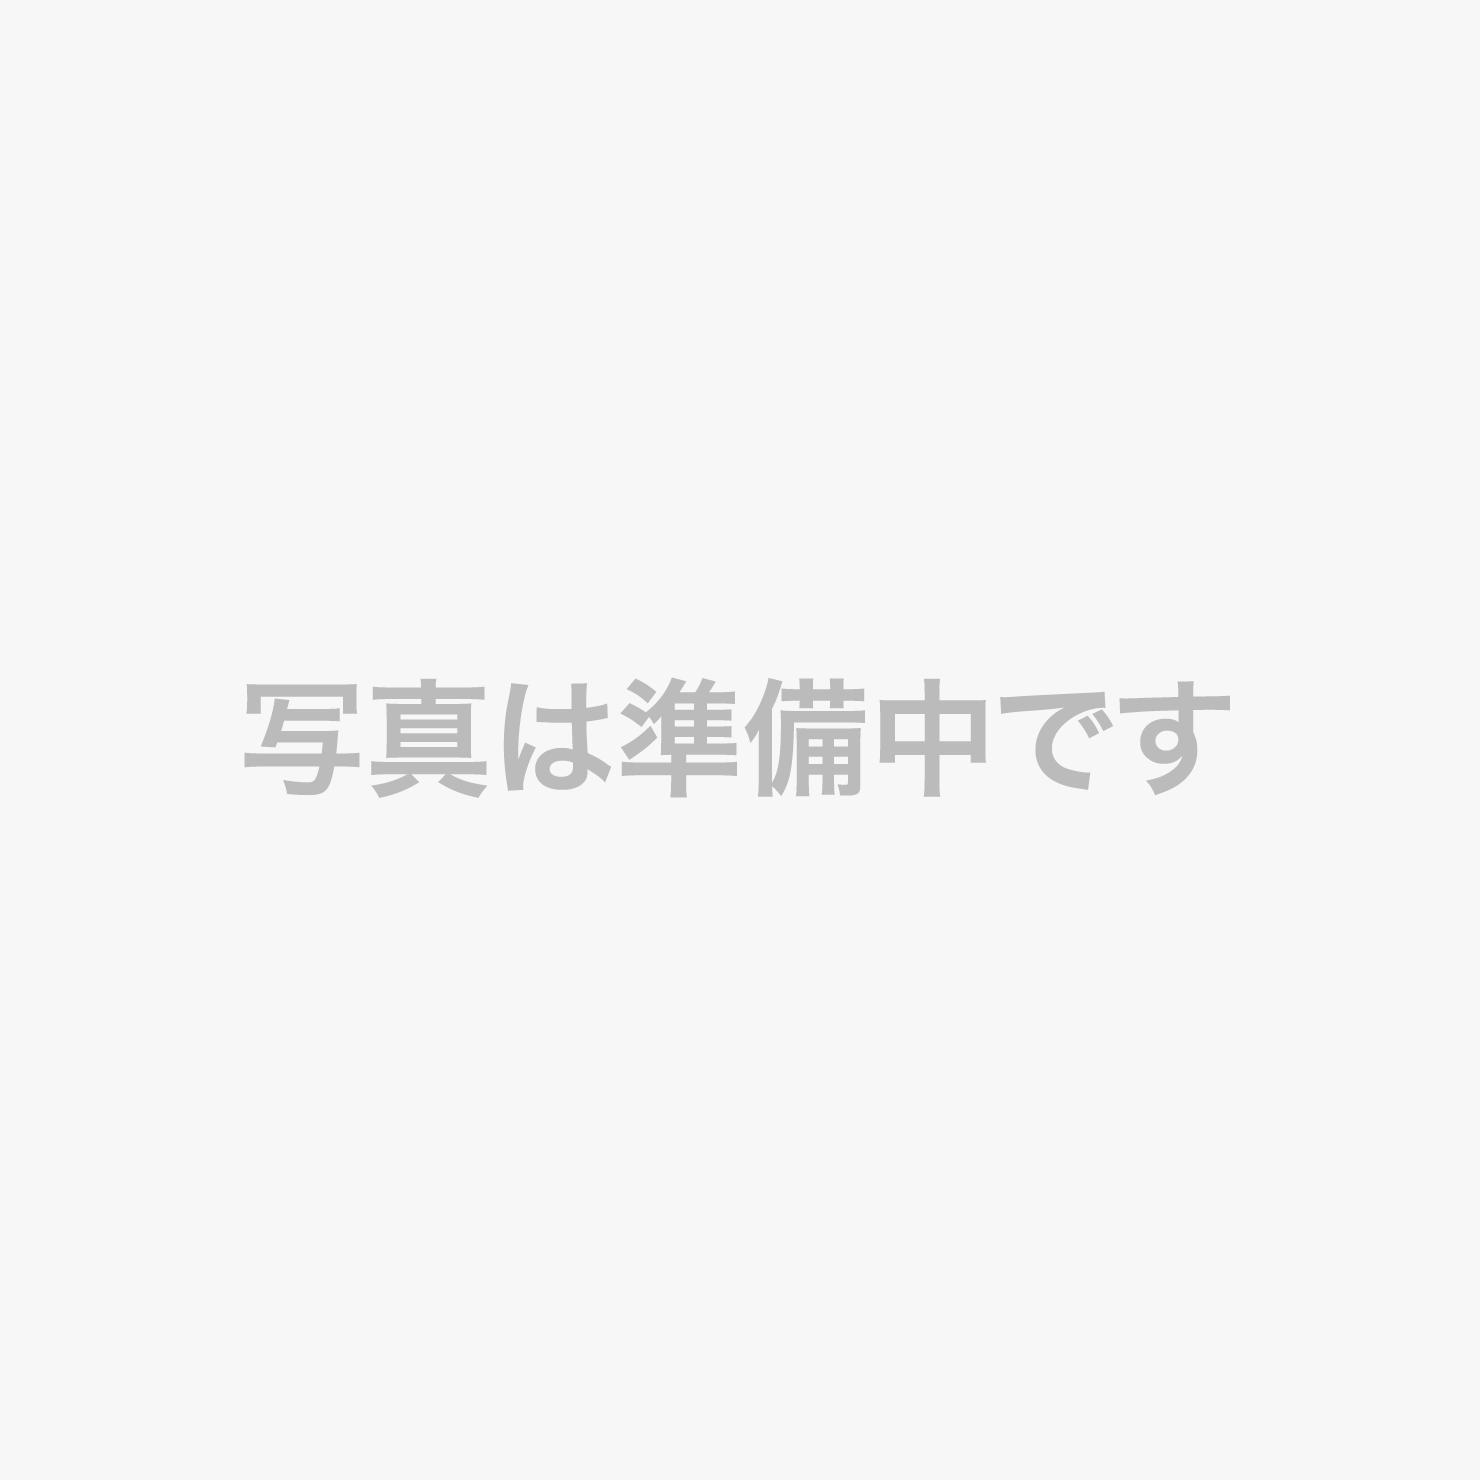 【岡山城】日本三名園の一つ。JR岡山駅/路面電車で4分/城下下車後徒歩10分